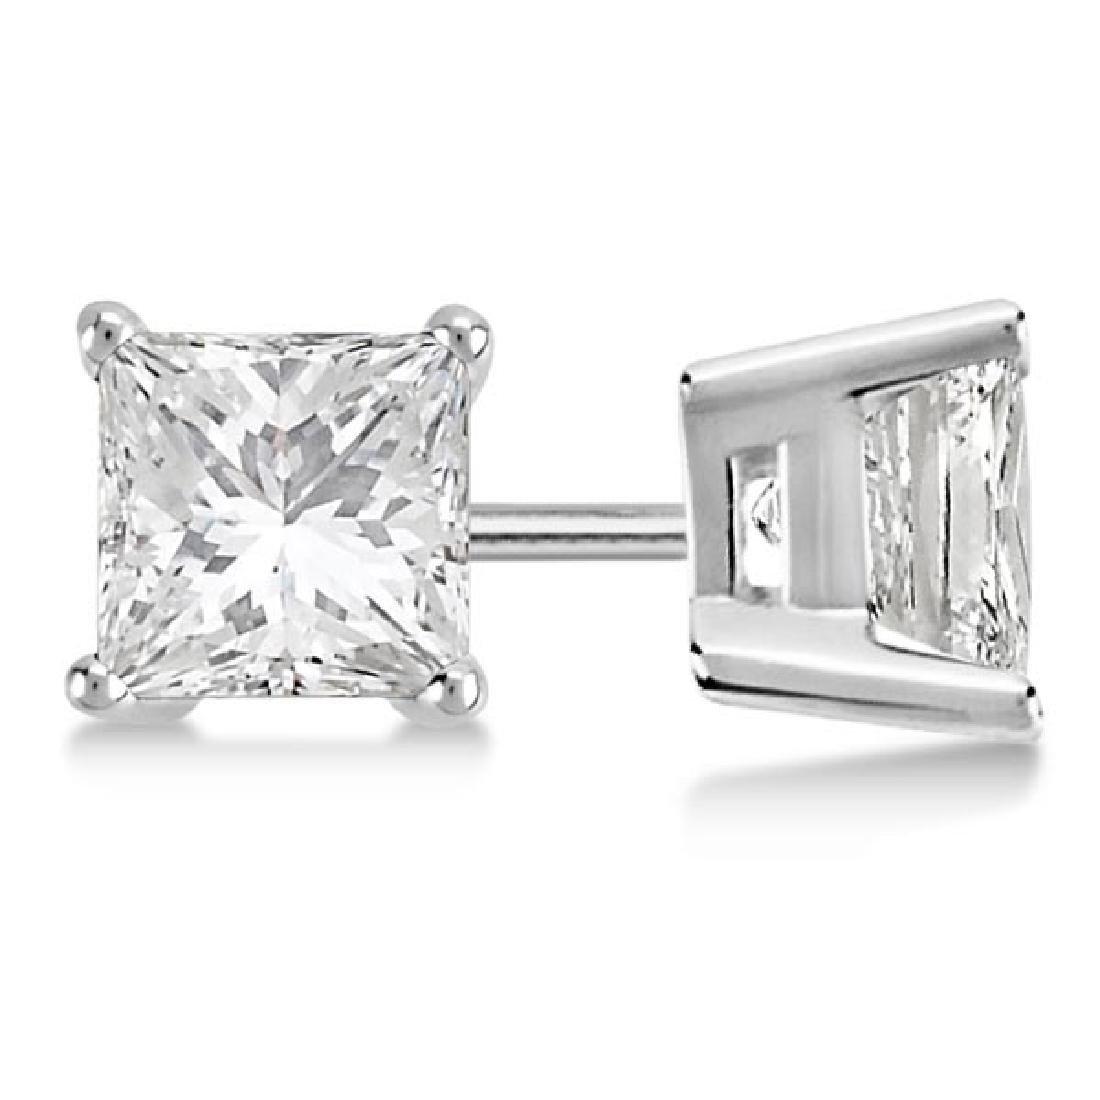 Certified 1.01 CTW Princess Diamond Stud Earrings H/SI1